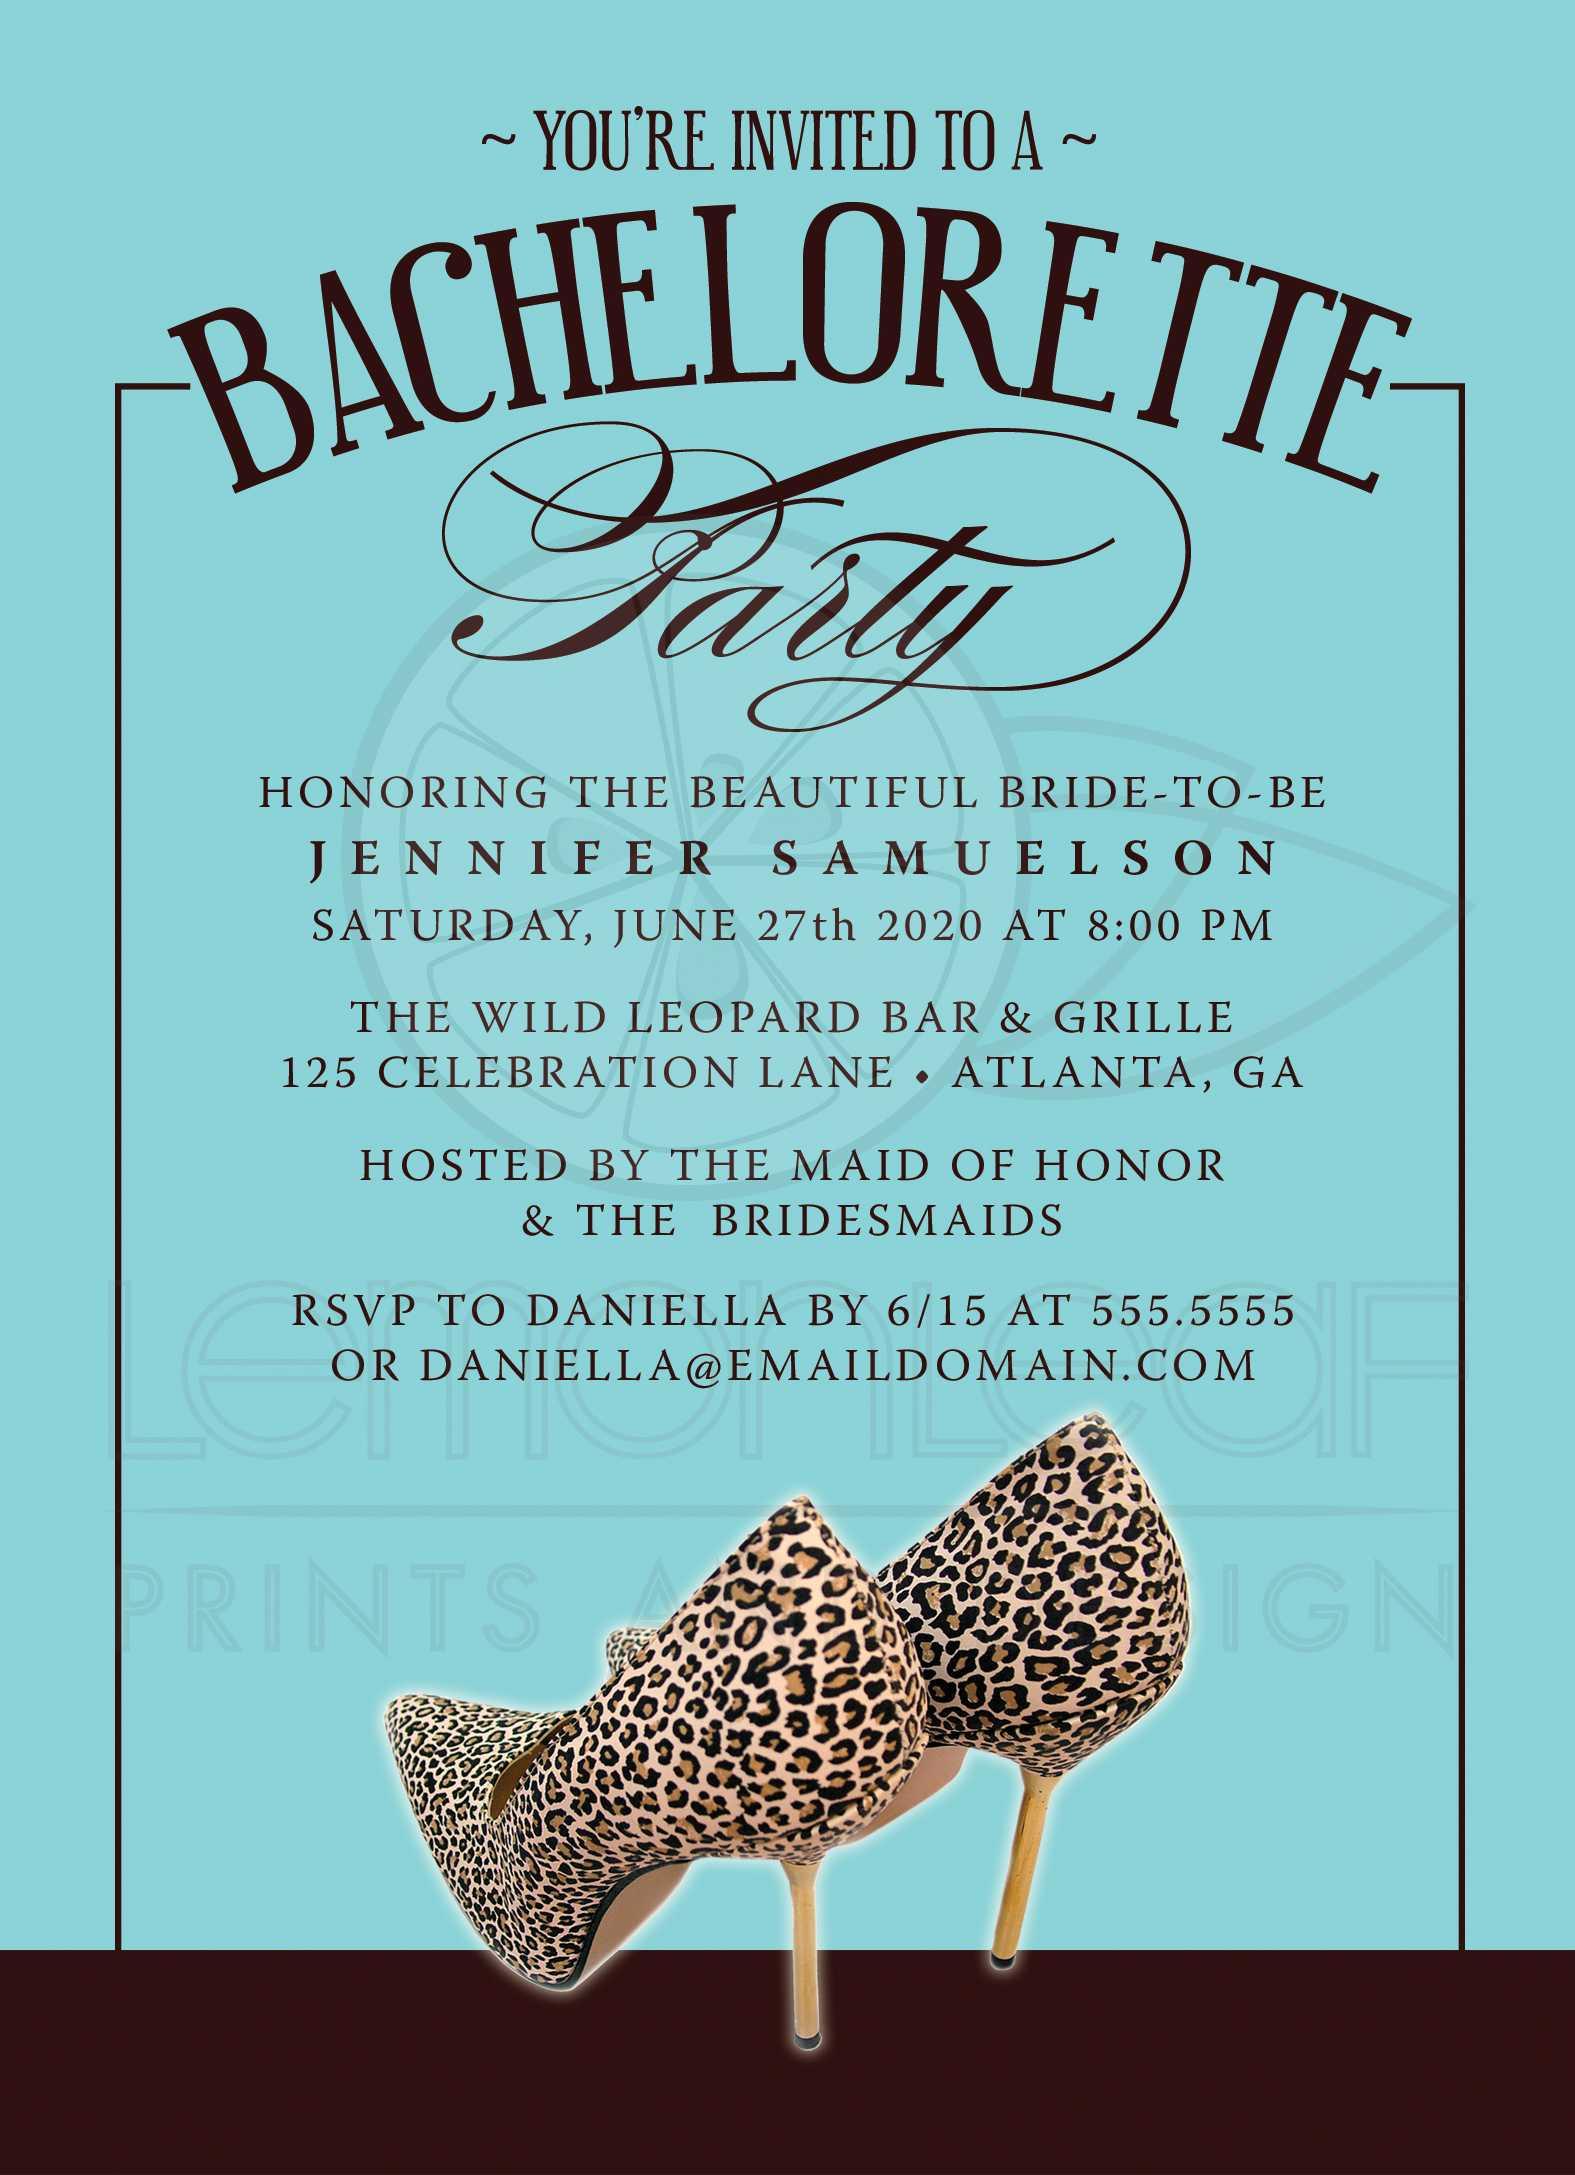 Bachelorette Party Invitations Leopard Print Shoes Turquoise